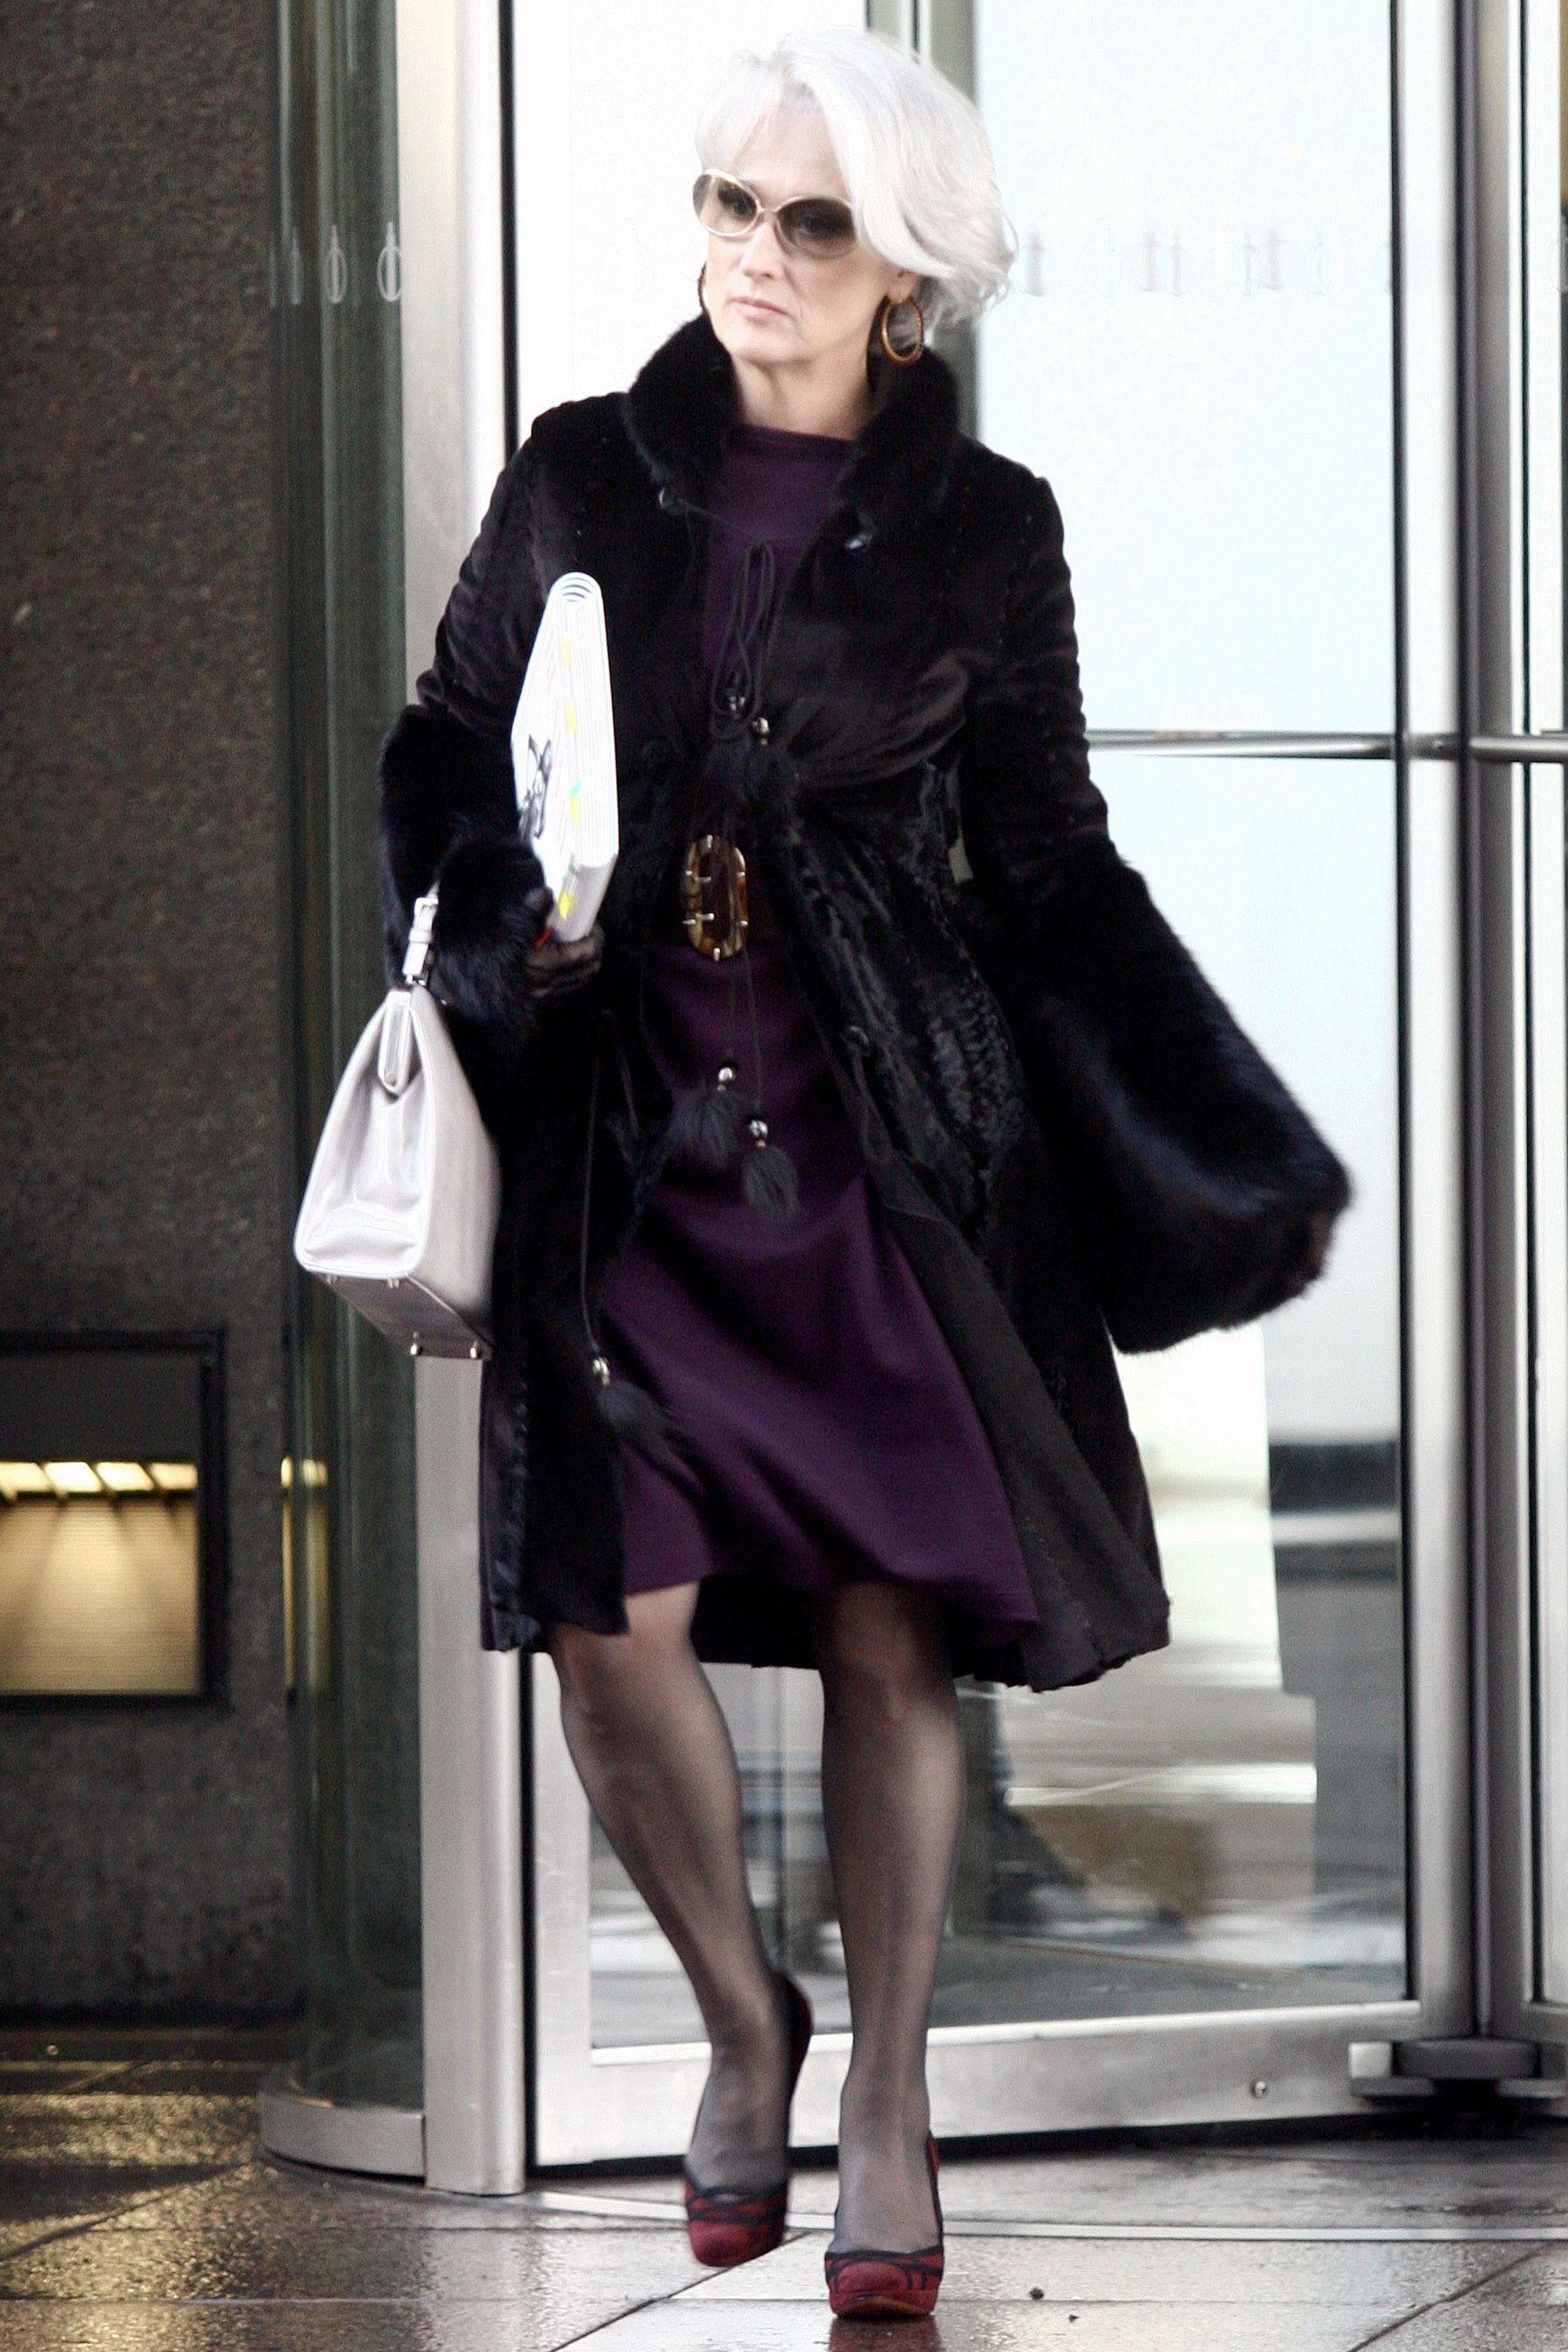 Miranda Priestly, The Devil Wears Prada. Wearing Fur And